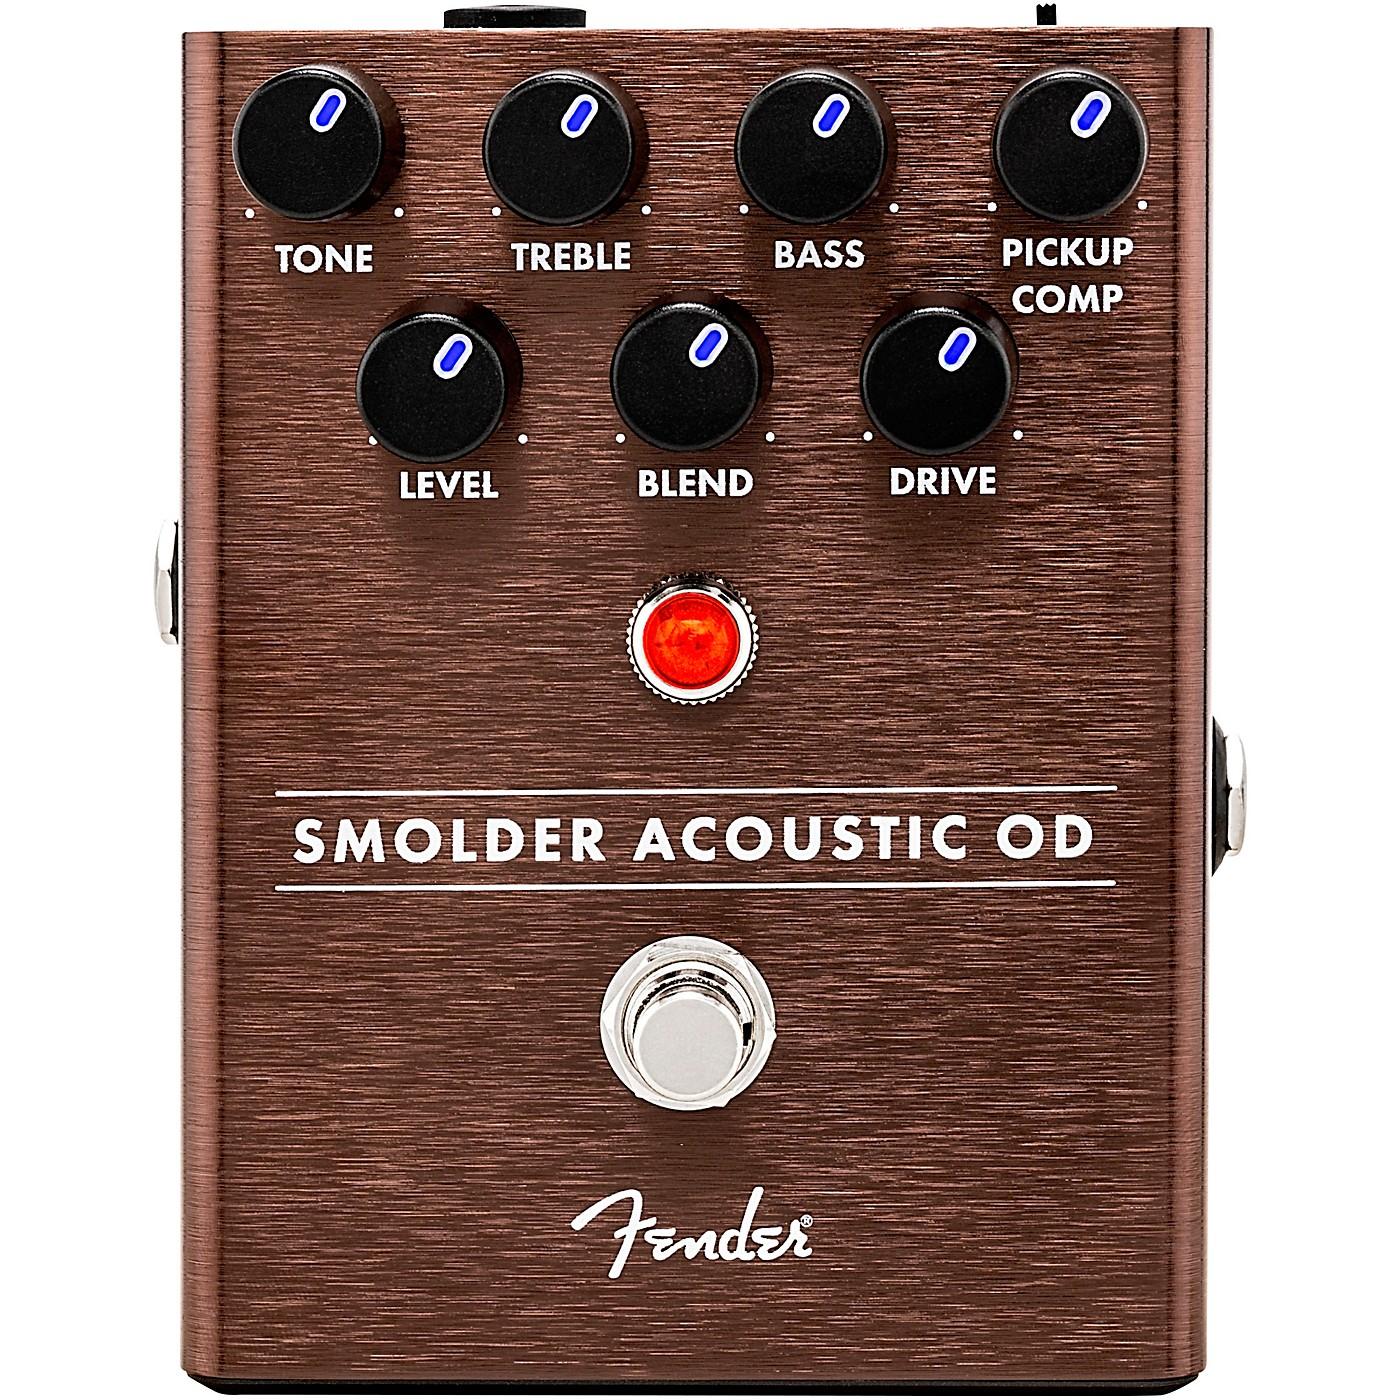 Fender Smolder Acoustic Overdrive Effects Pedal thumbnail